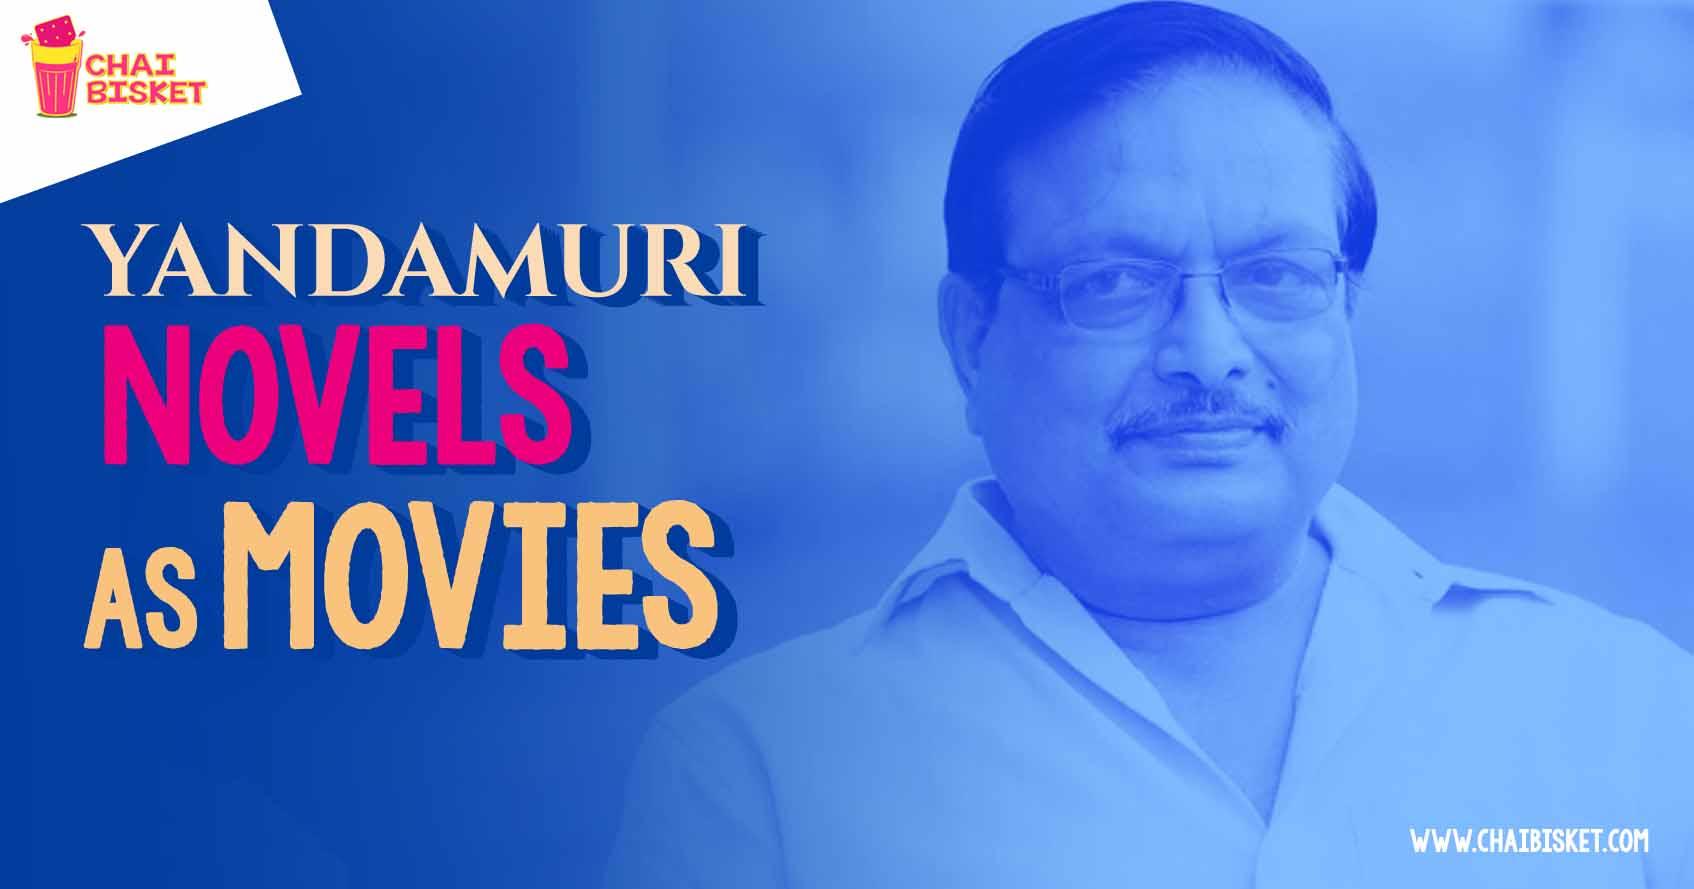 Yandamuri veerendranath s tamil novels